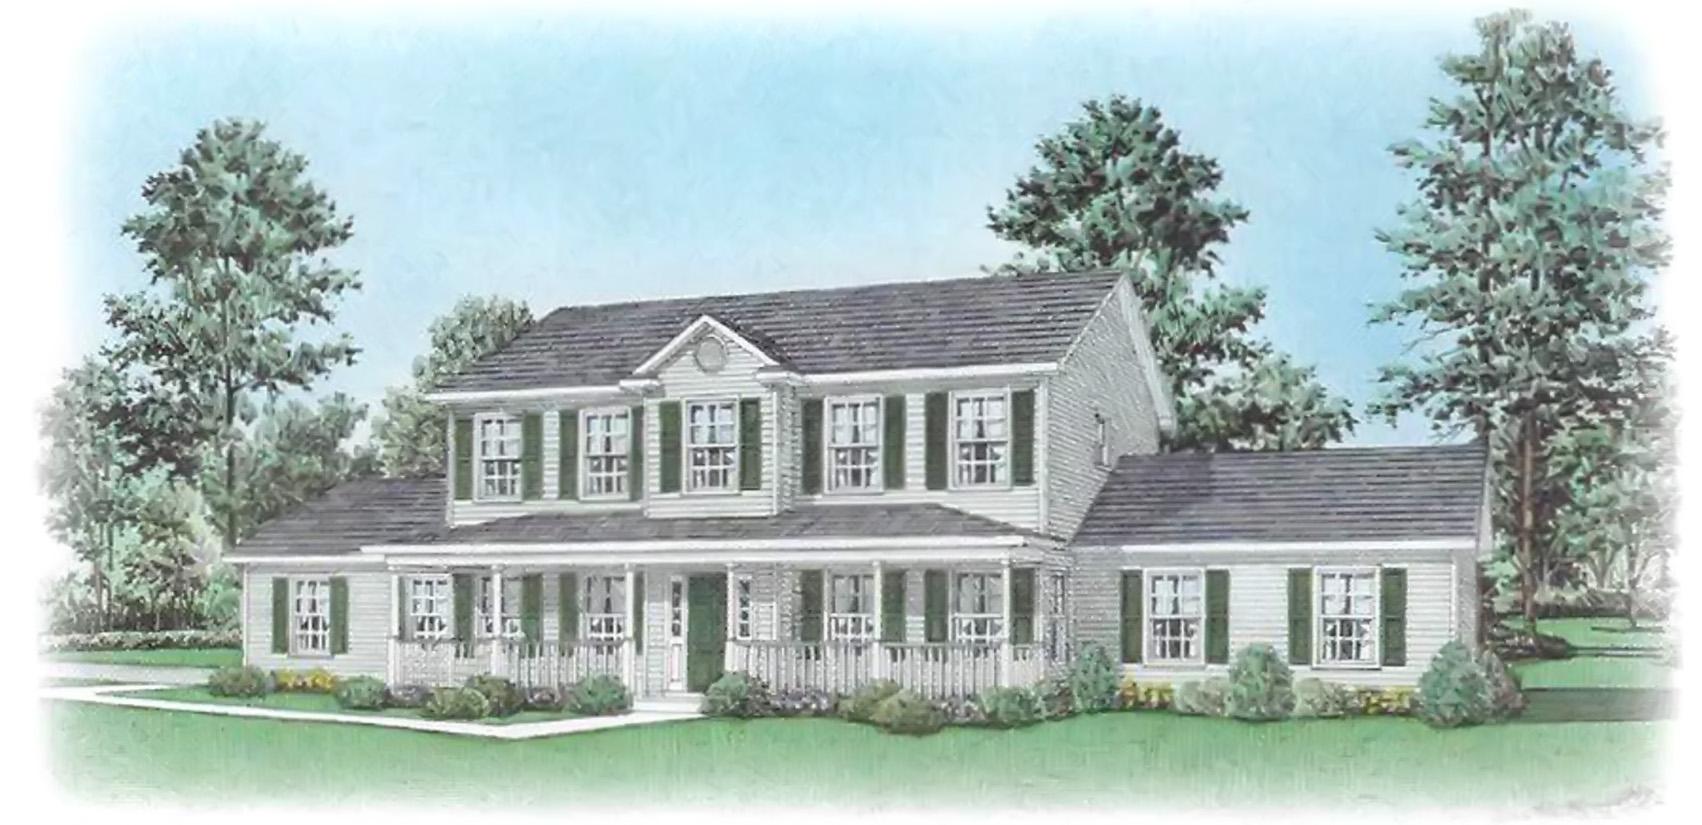 Munsbury Grand B Pennyworth Homes Tallahassee Home Builder